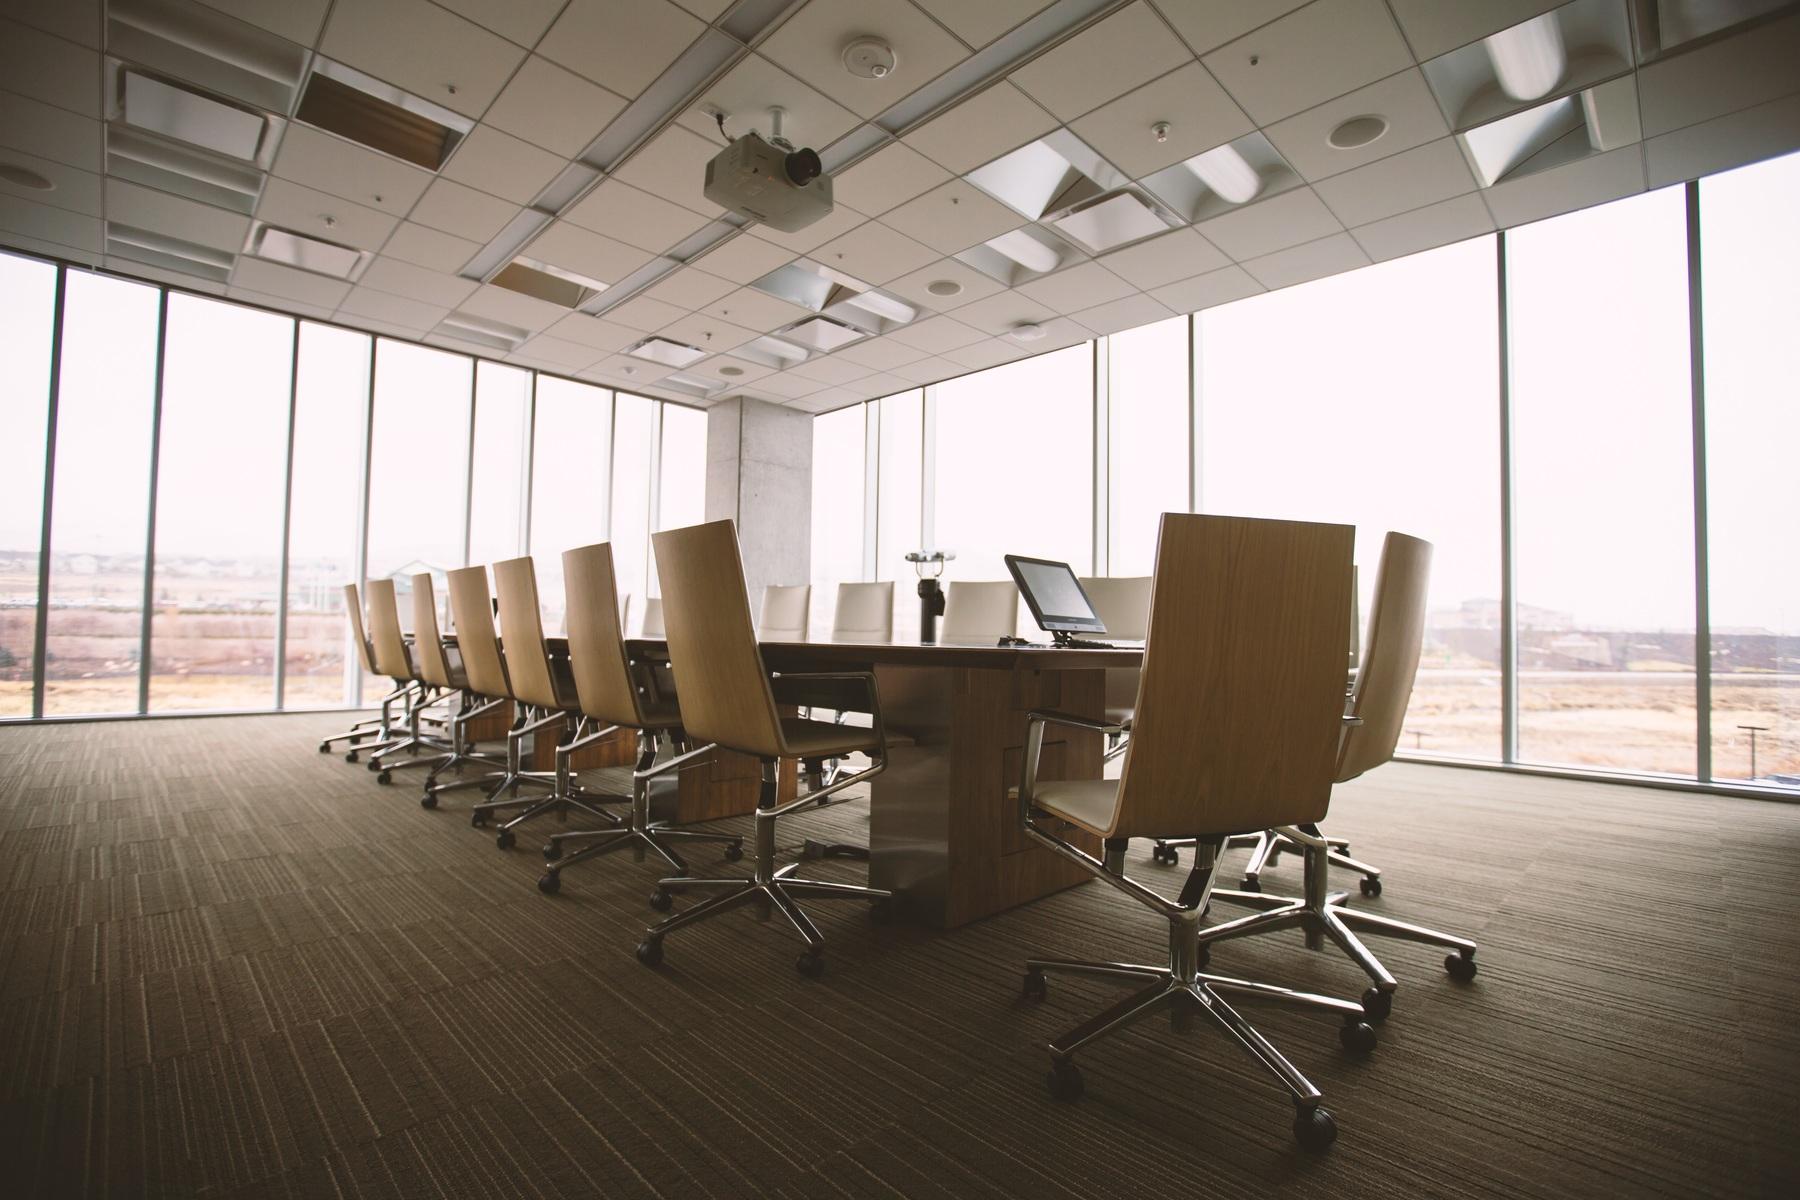 work-table-structure-wood-auditorium-floor-727881-pxhere.com_.jpg